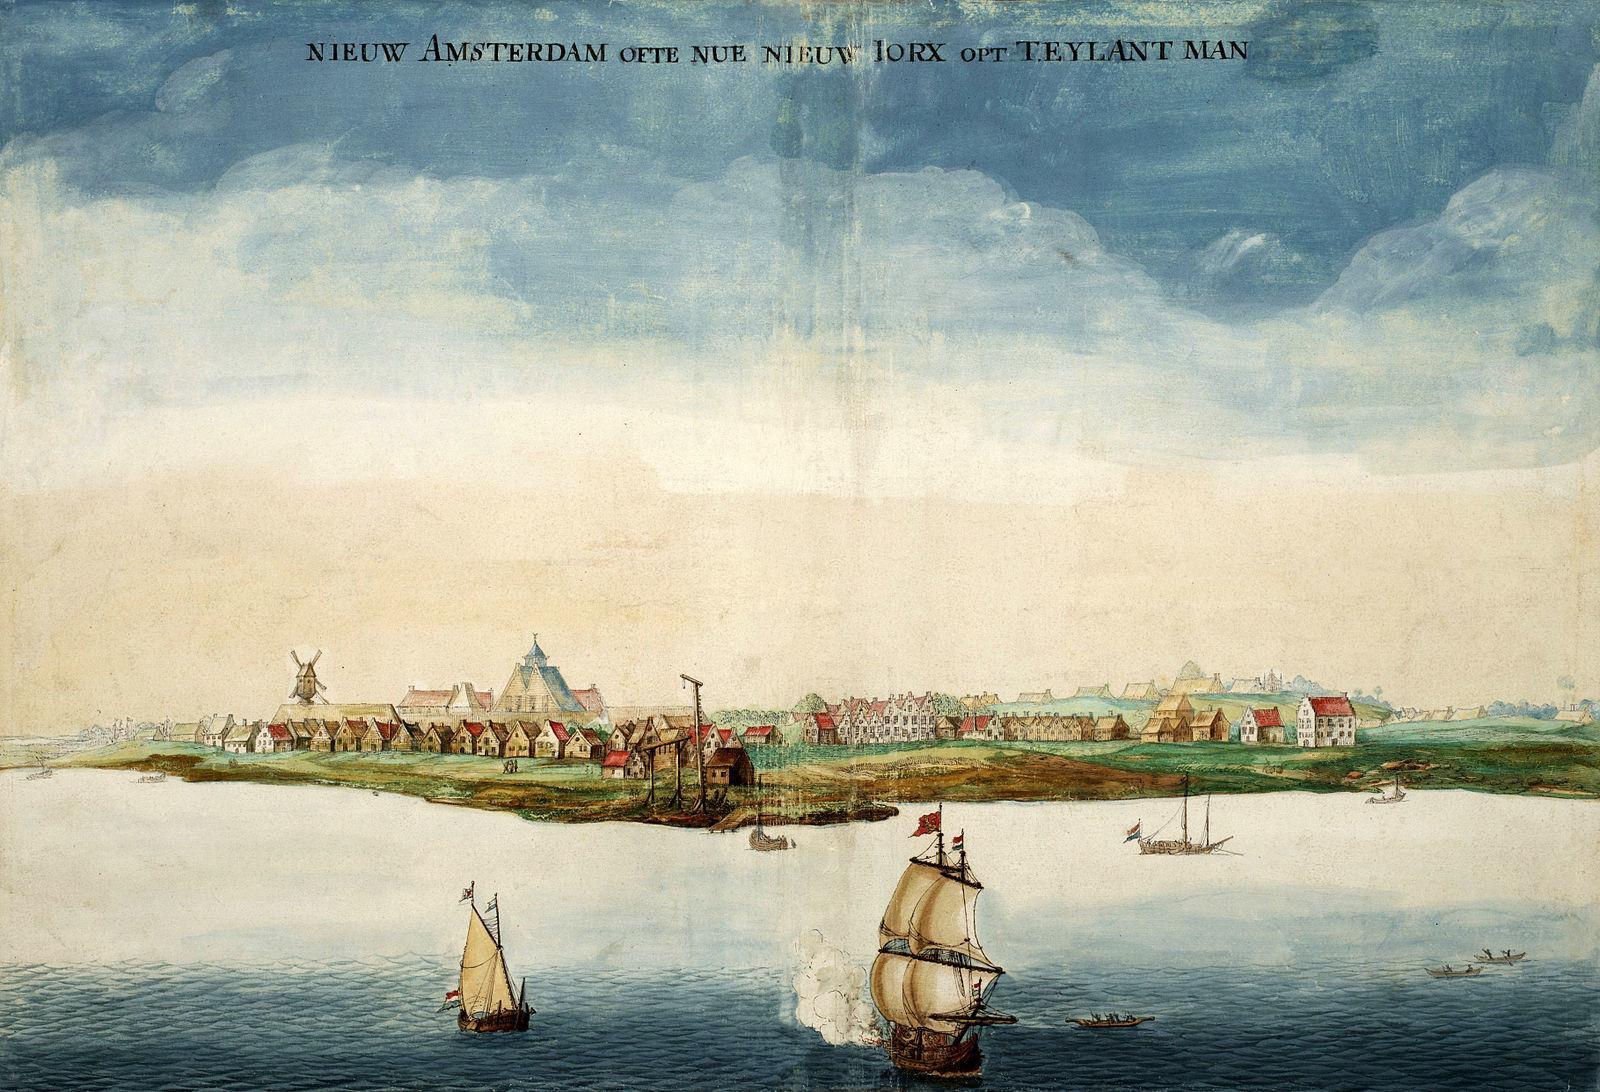 Dutch New Amsterdam